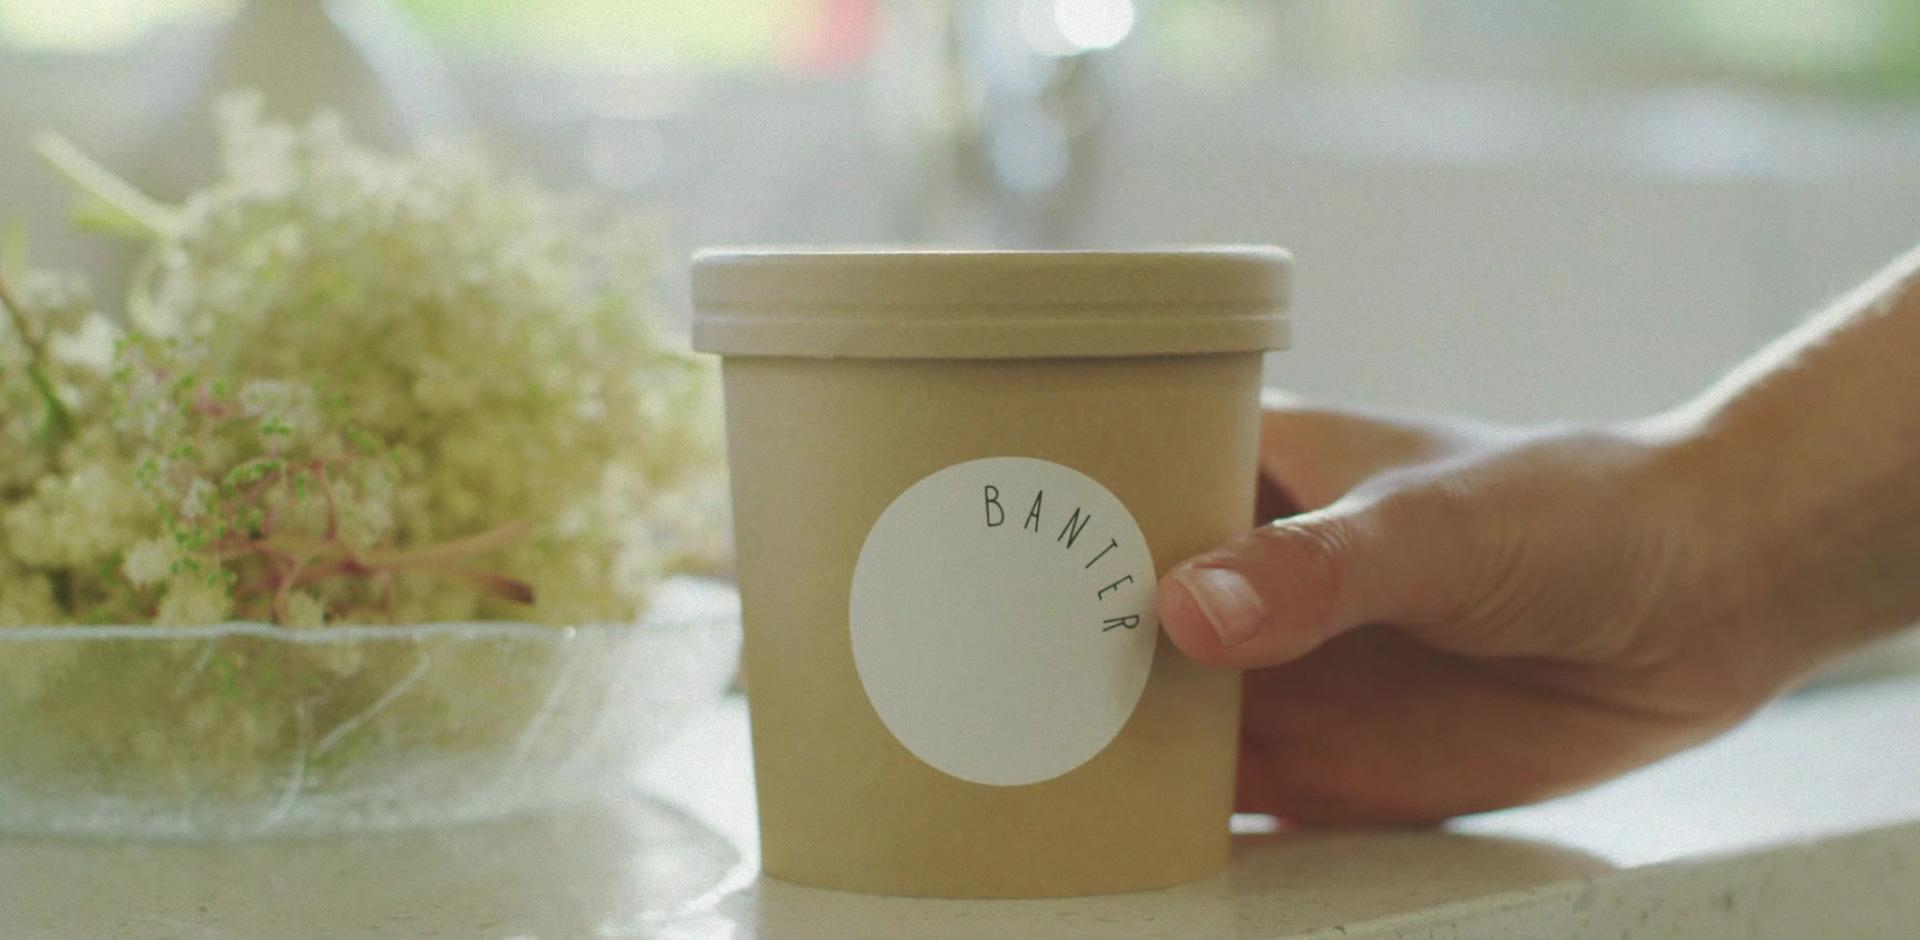 Banter Ice Cream